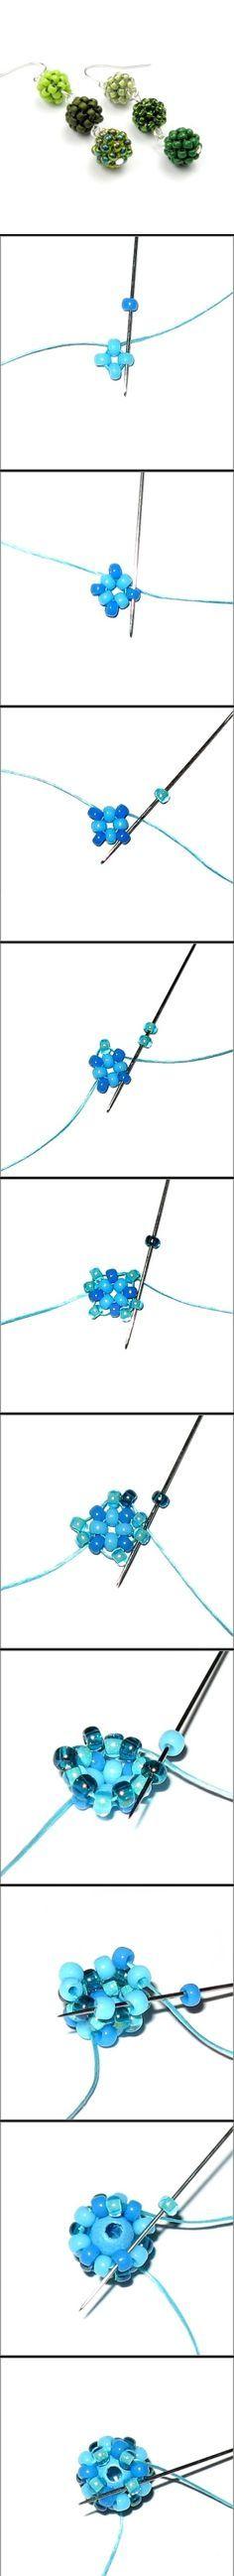 ❦ Tutorial ❦ ∙∙∙ Beaded Bead - http://thecrimsonmoon.wordpress.com/2012/10/14/free-beaded-bead-tutorial-atom-beads/